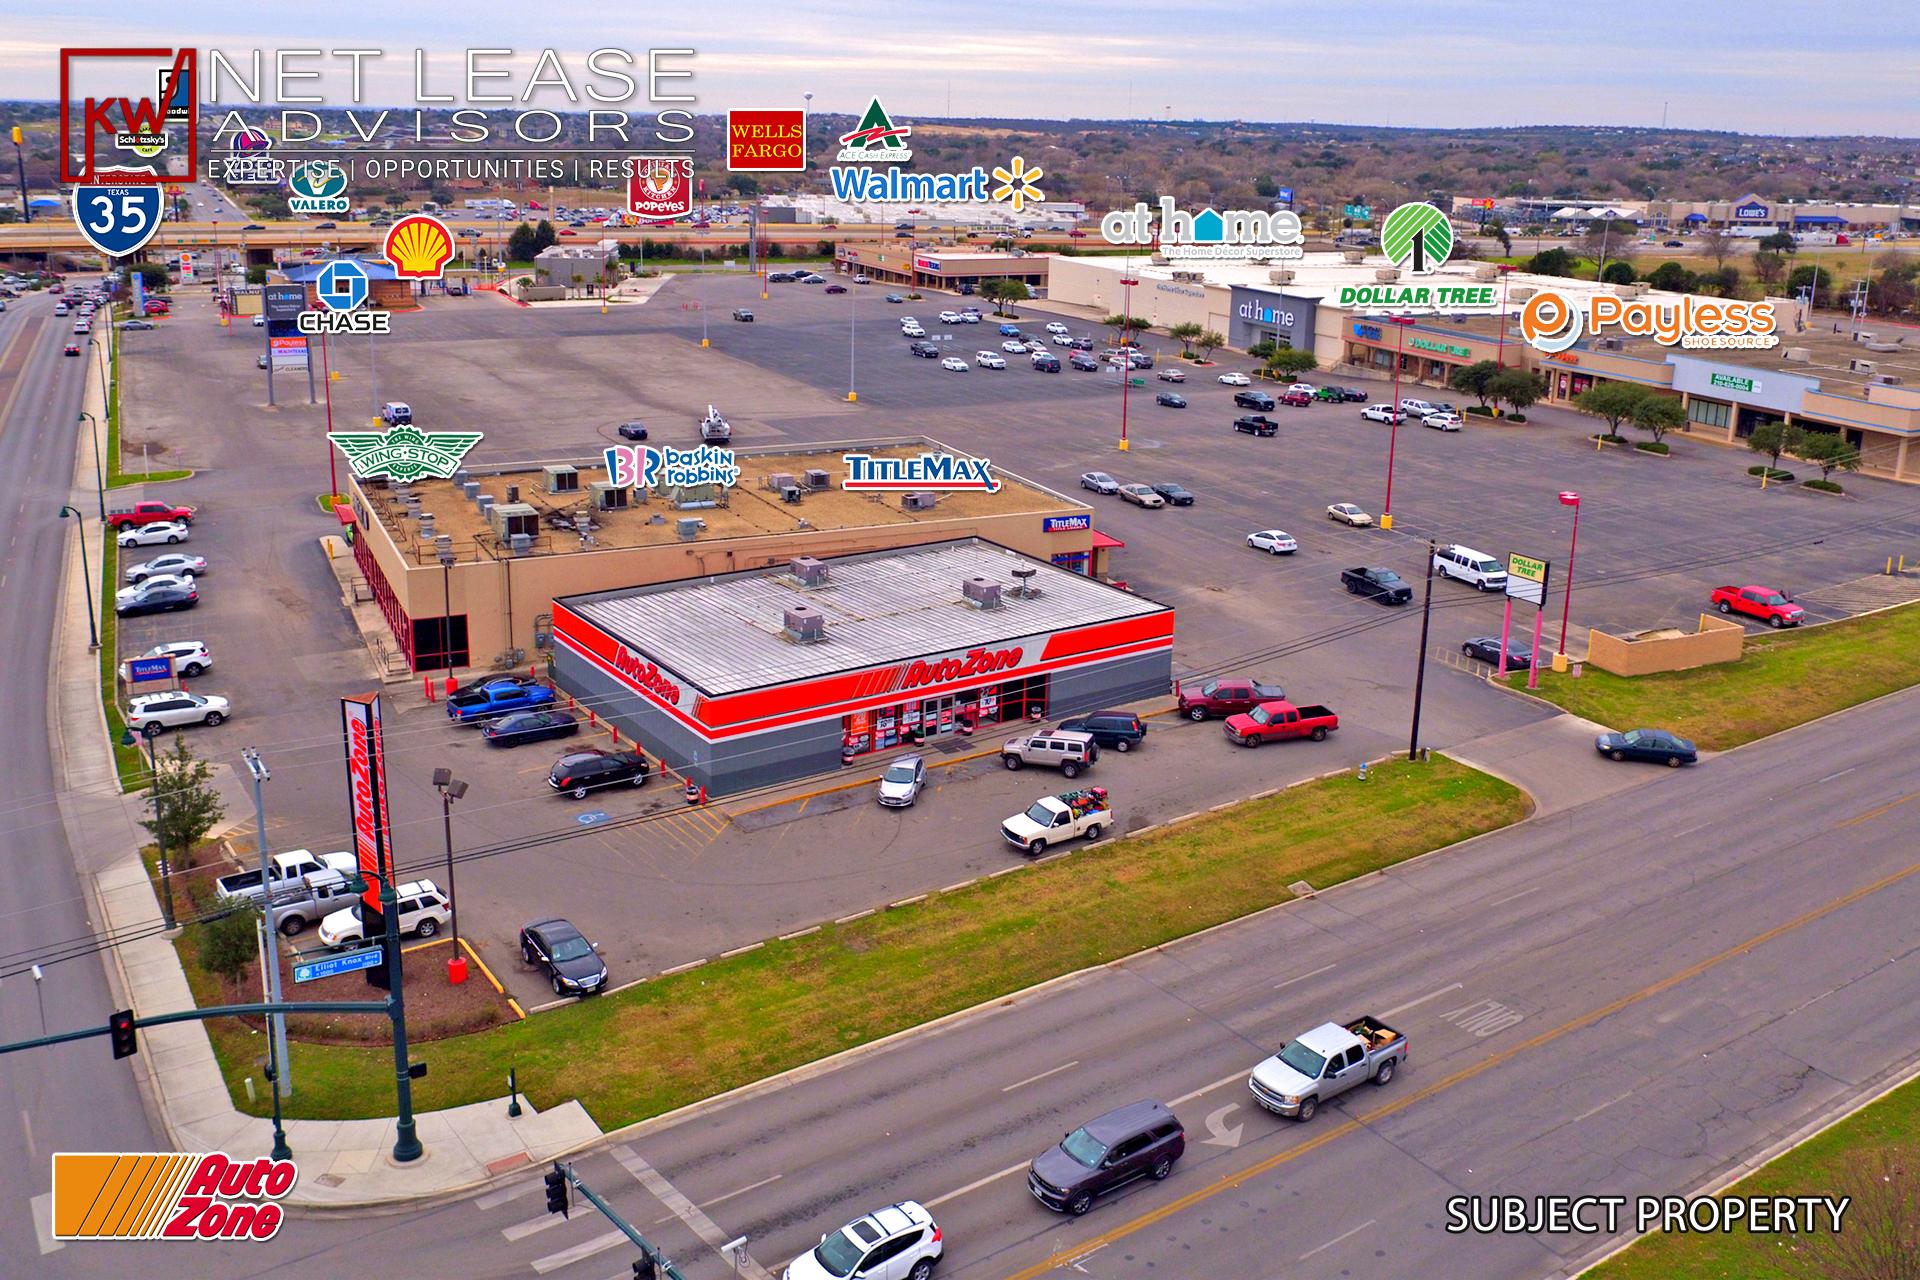 Just Listed Autozone 1368 New Braunfels Texas